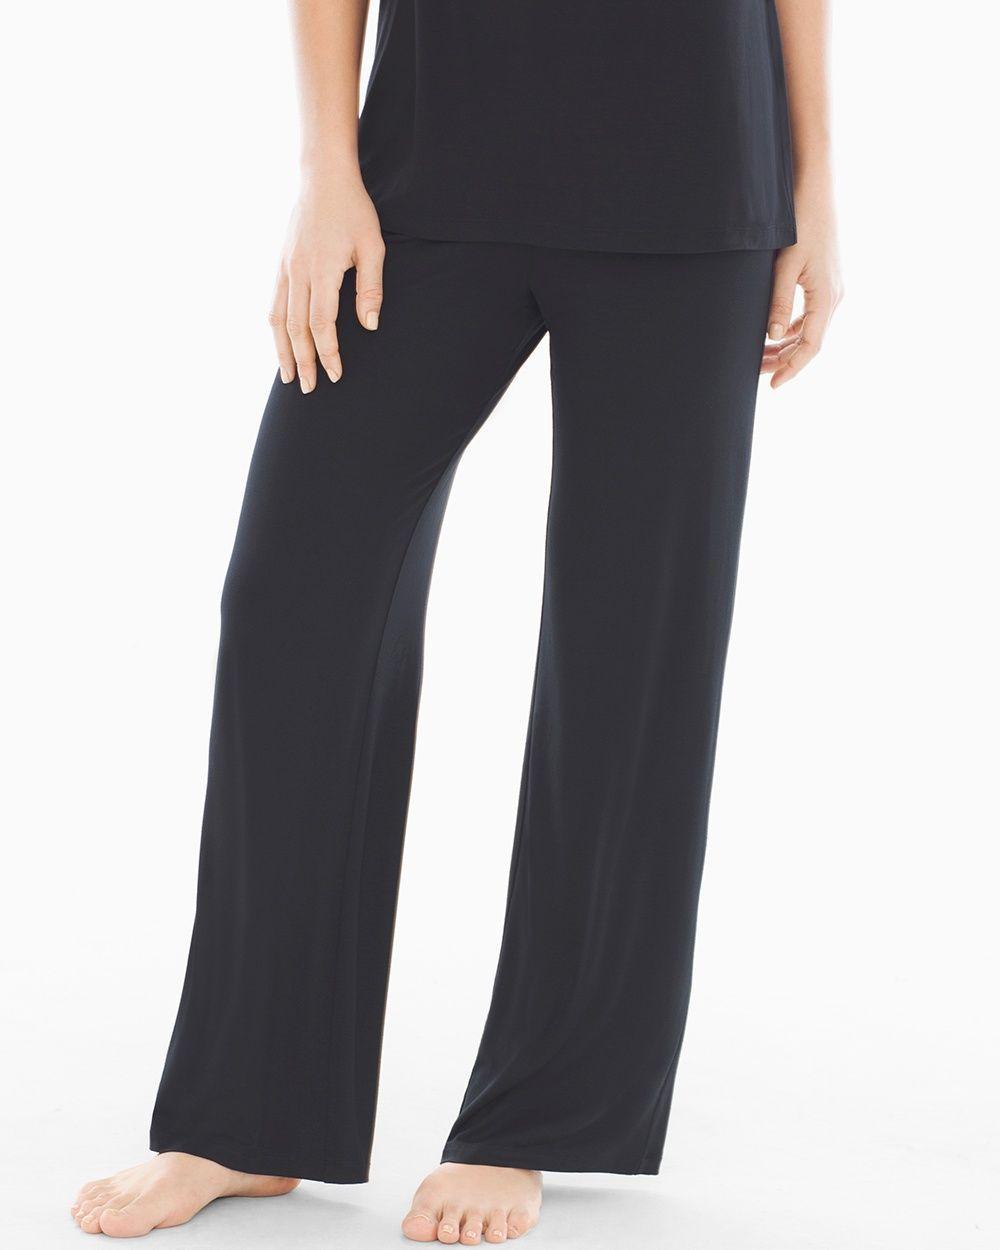 Soma Embraceable Cool Nights Pajama Pants Black  58321fbd3